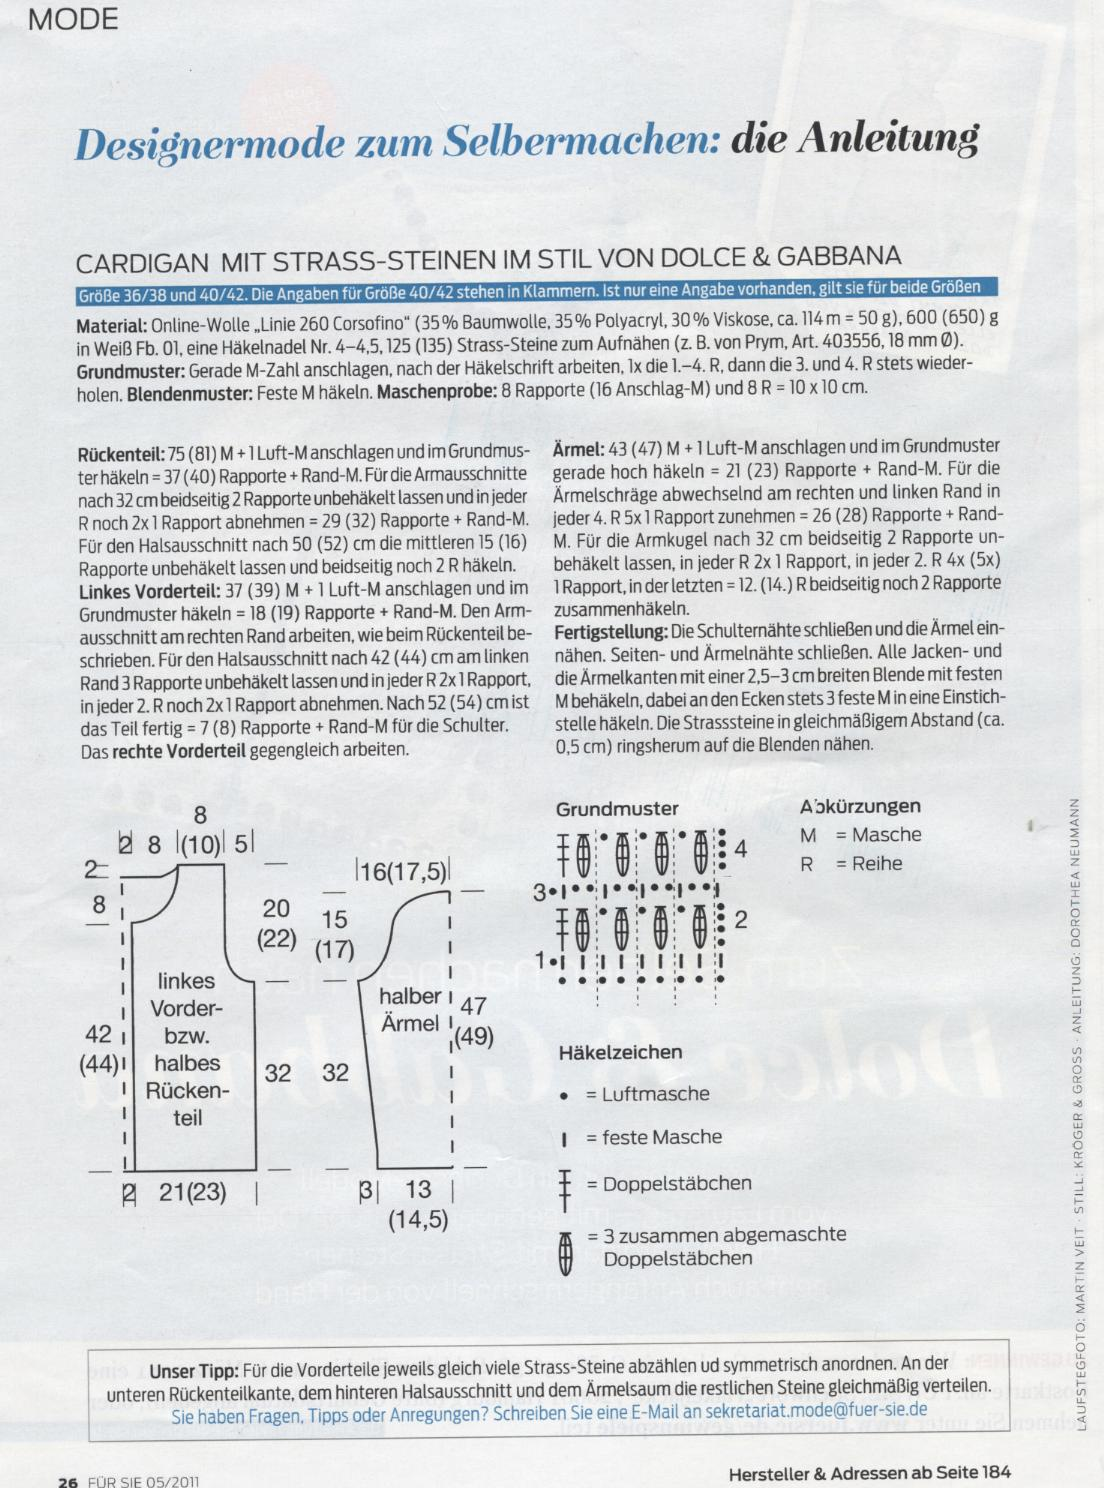 PROVOCAREA NR.13 - CROSETAT - TOAMNA - Pagina 2 2wf1so6